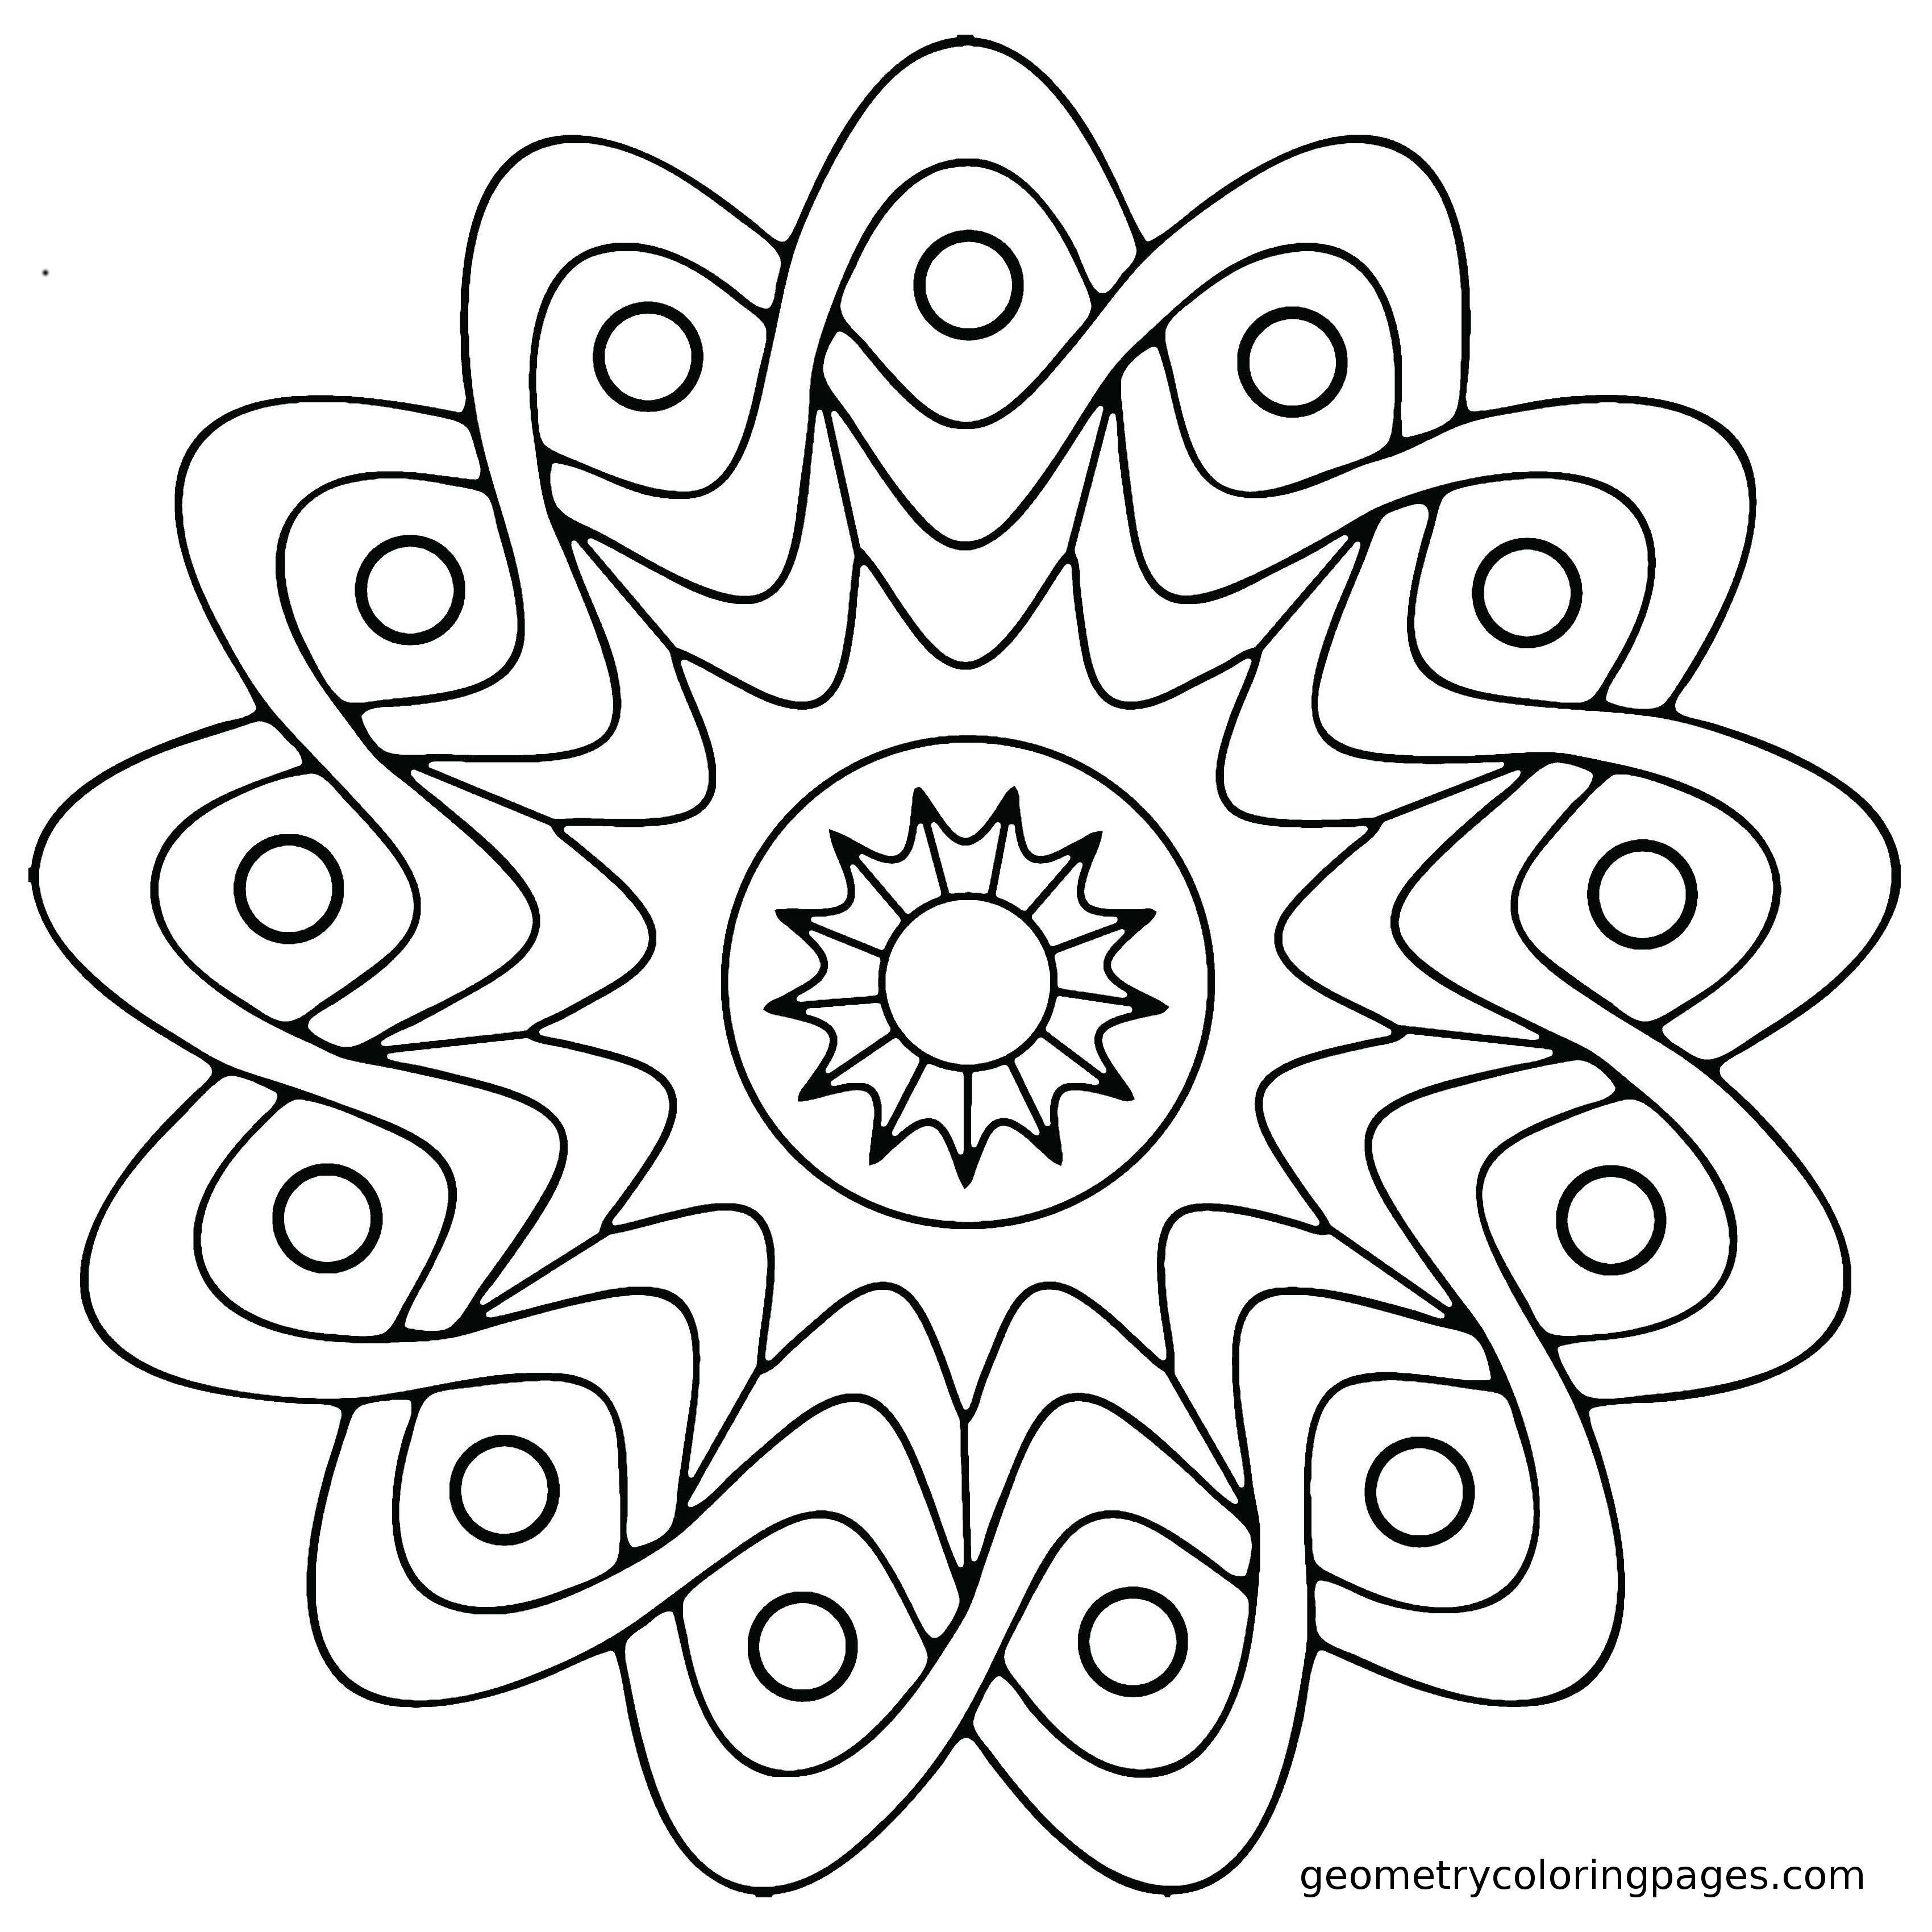 149 Dibujos Para Imprimir Colorear O Pintar Para Ninos